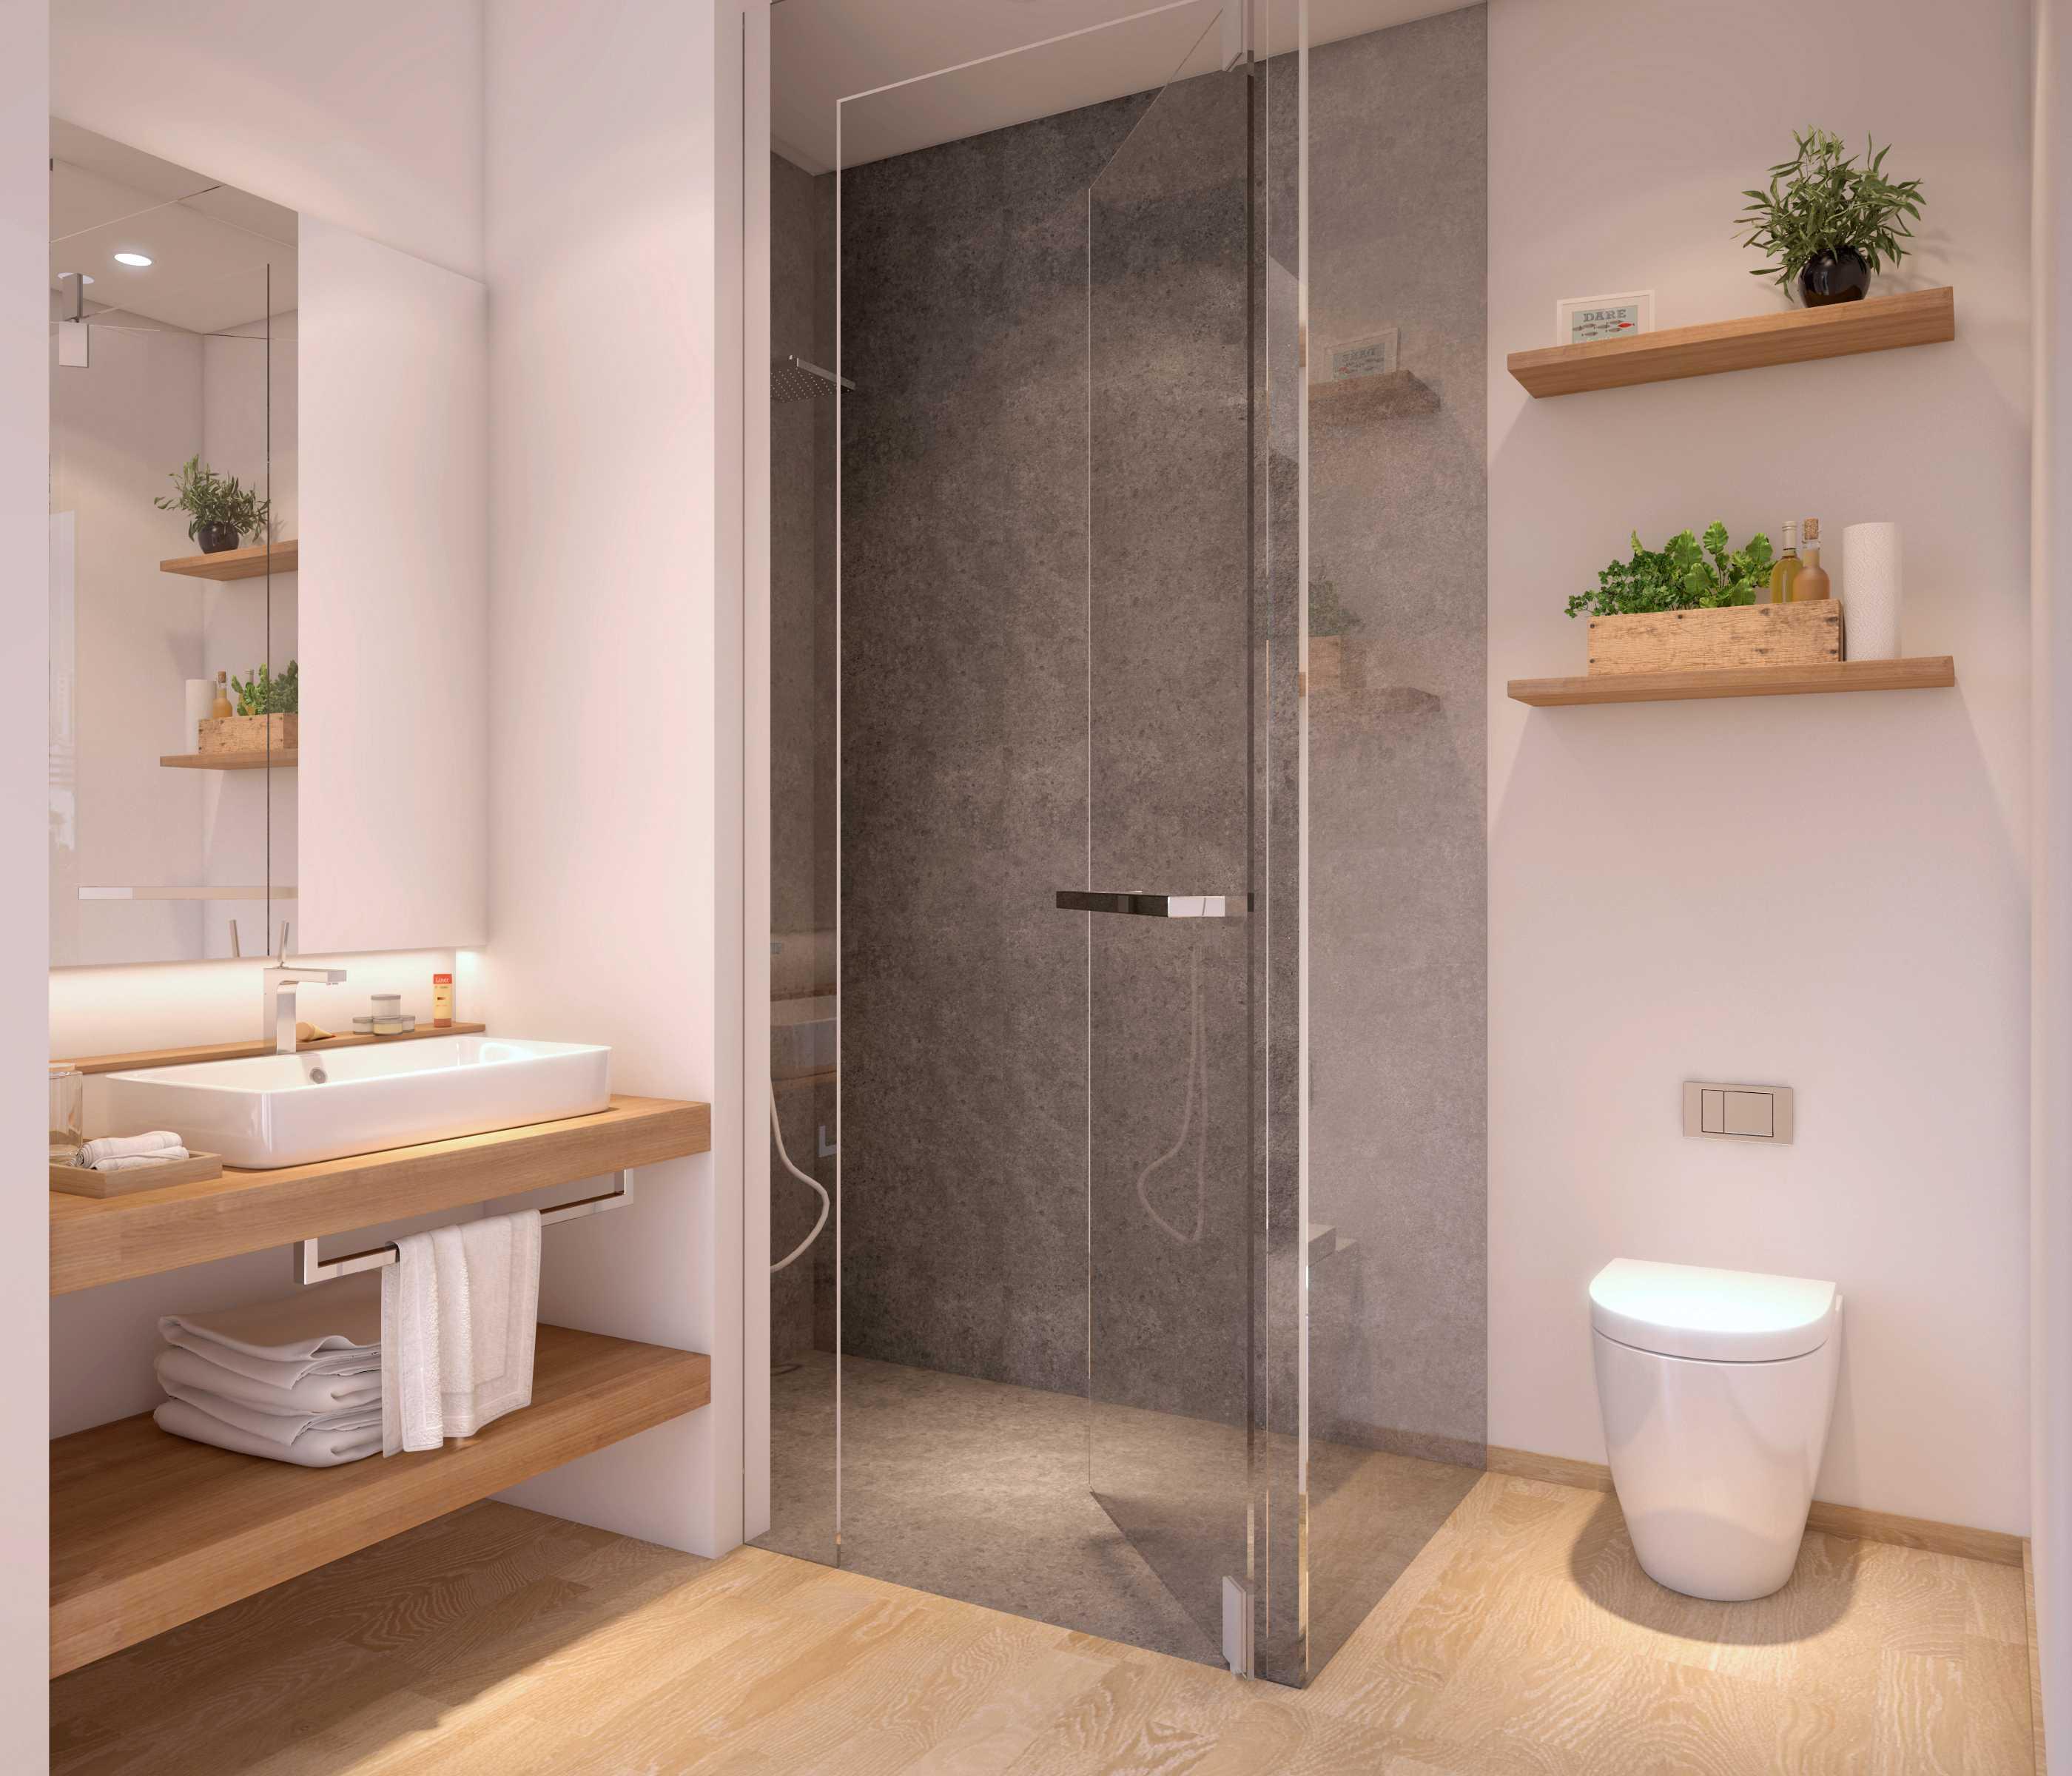 Erre Luce | Lighting+Interior W Residence Sentul City Sentul City Bathroom   10332